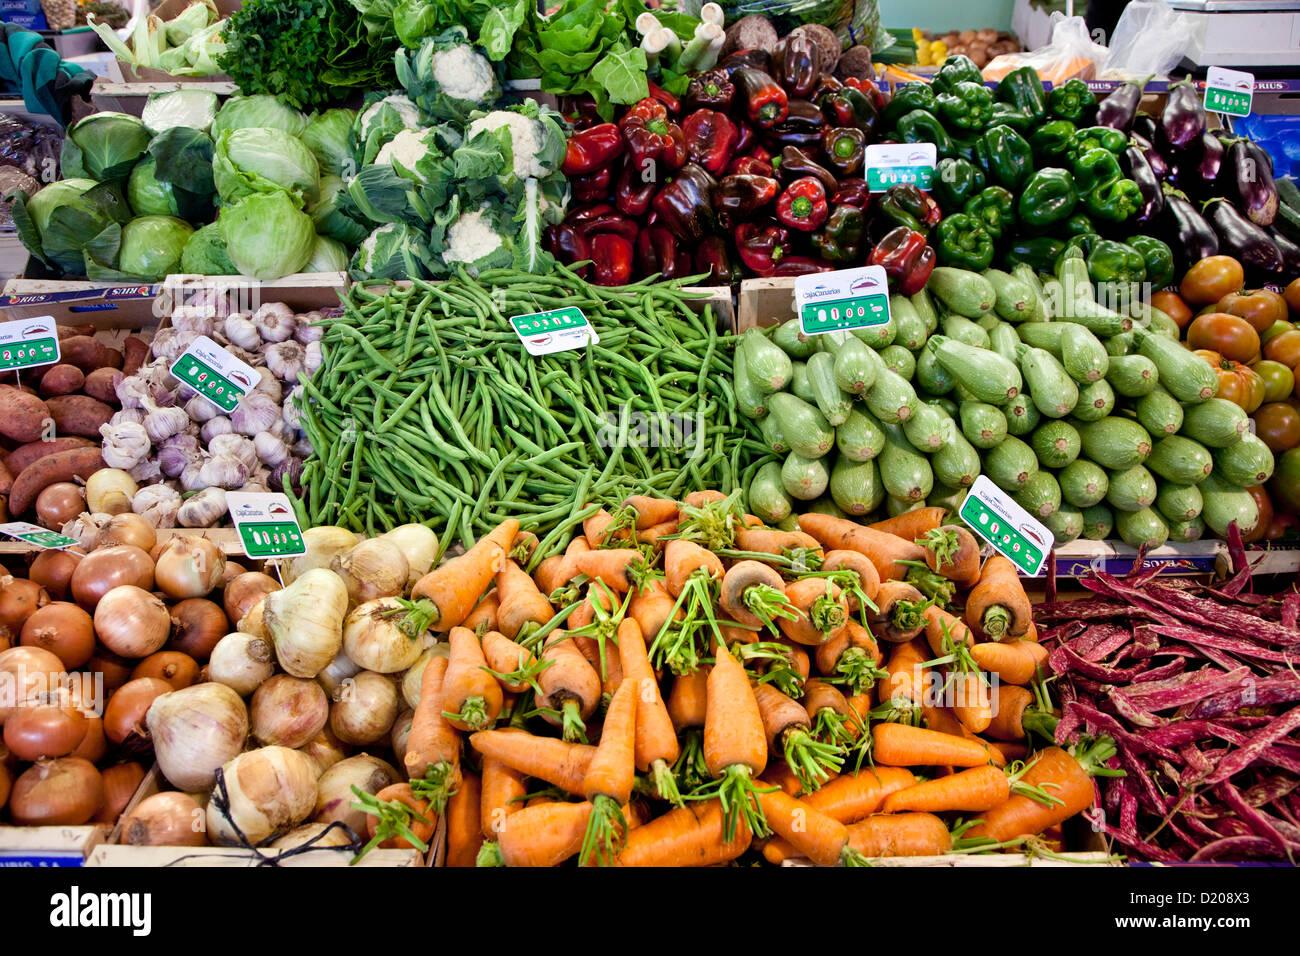 Farmers market, Mercado Agricola, Vega de San Mateo, Gran Canaria, Canary Islands, Spain - Stock Image